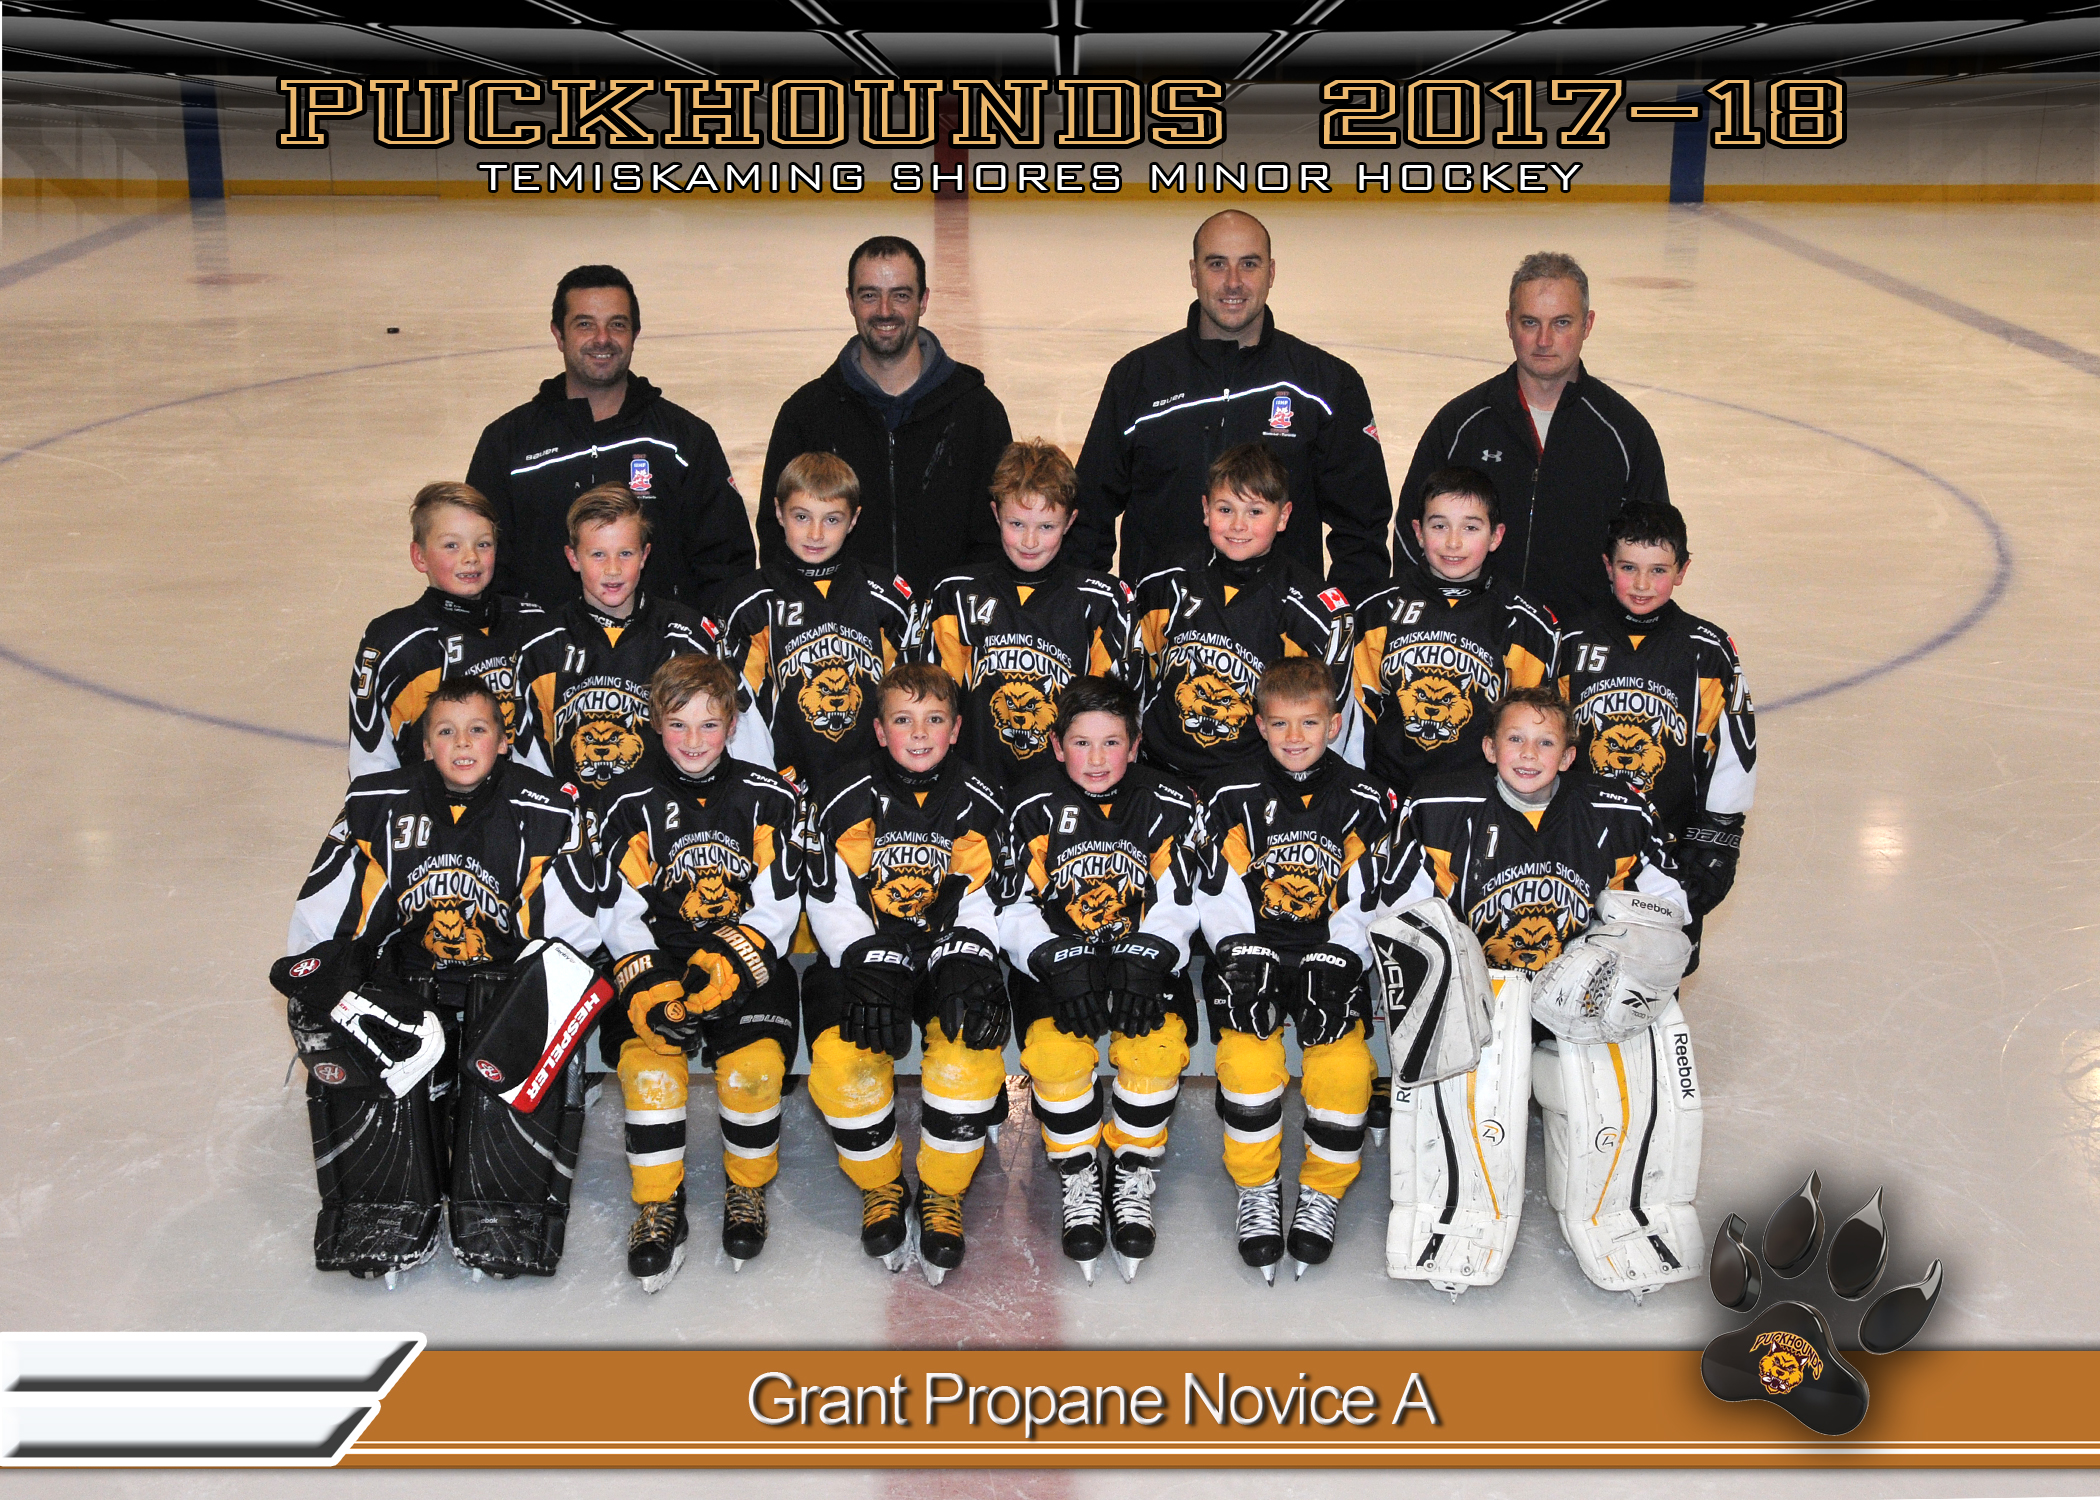 Grant Propane Novice Hockey